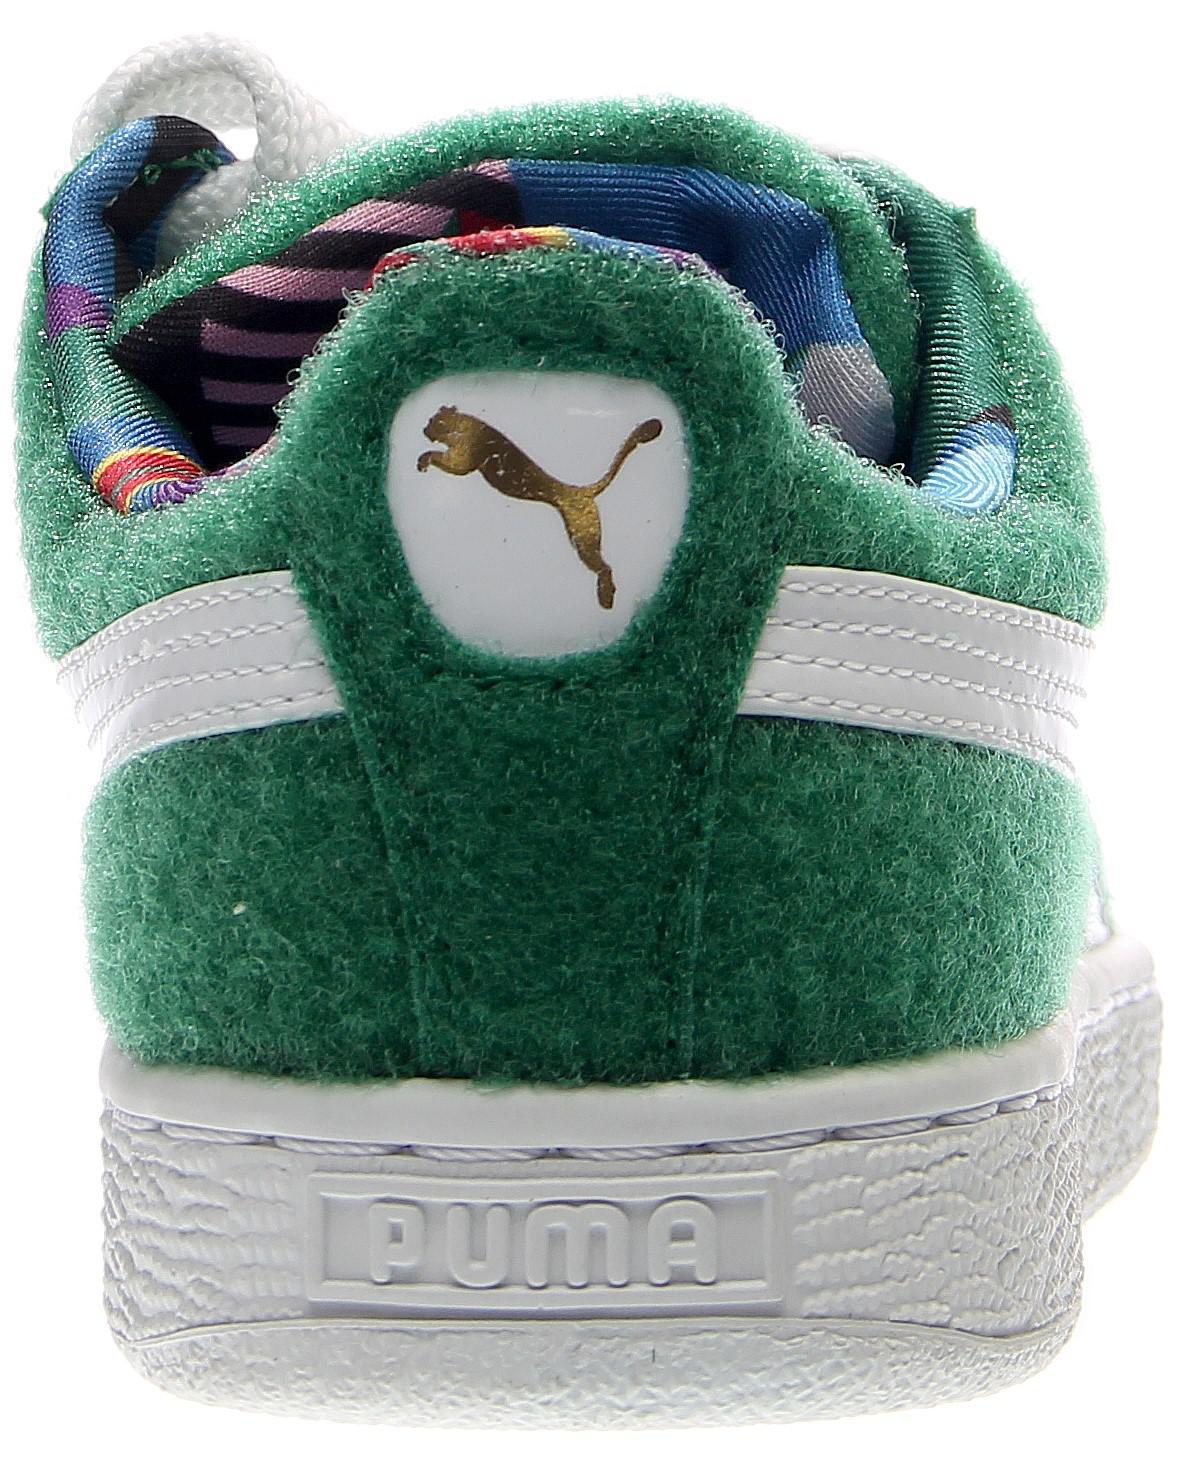 8a5e0ee7333 PUMA - Green X Dee   Ricky Basket - Lyst. View fullscreen